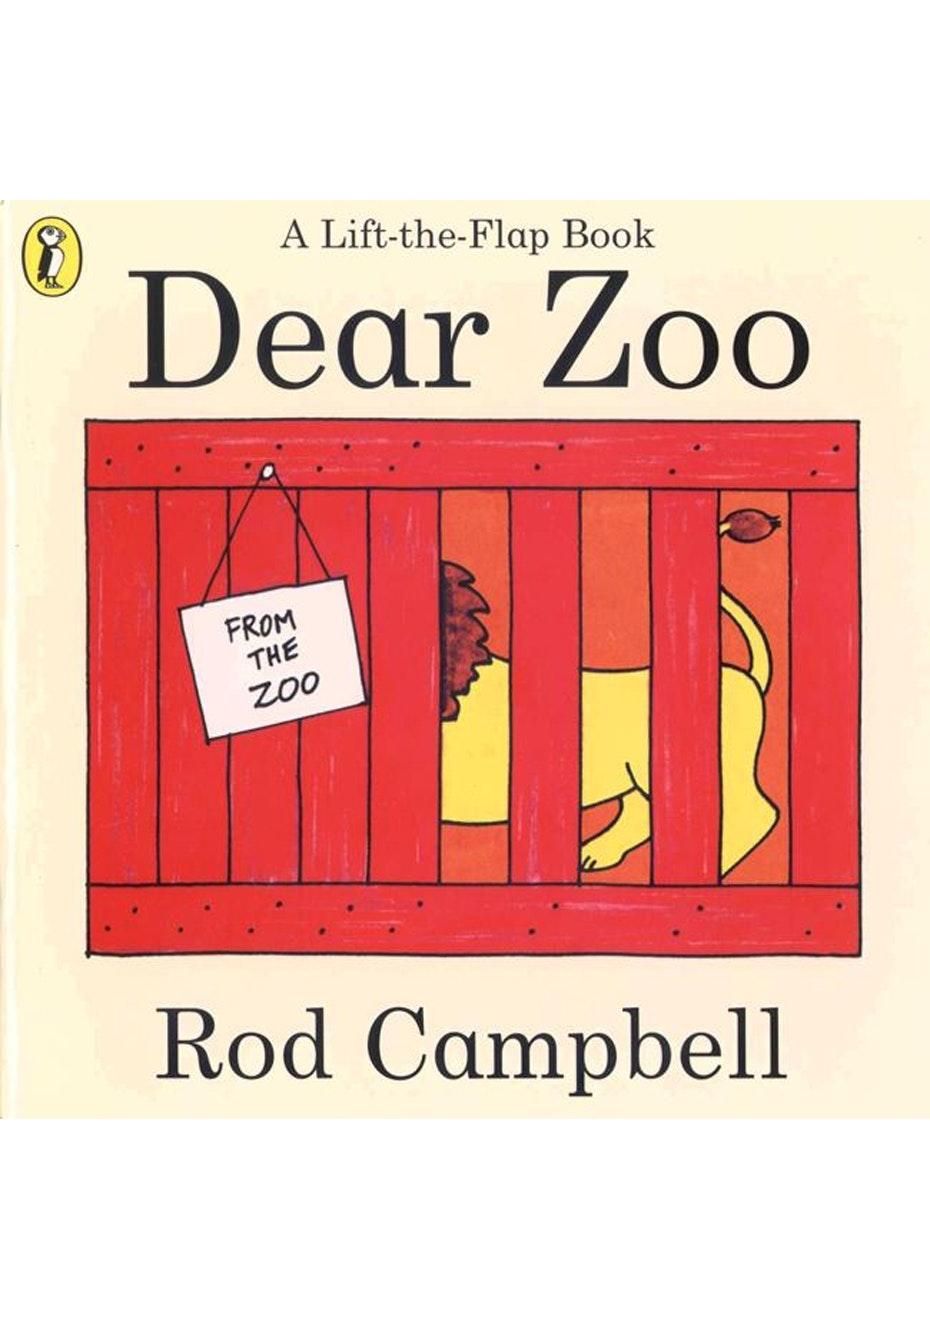 Dear Zoo, by Rodney Campbell